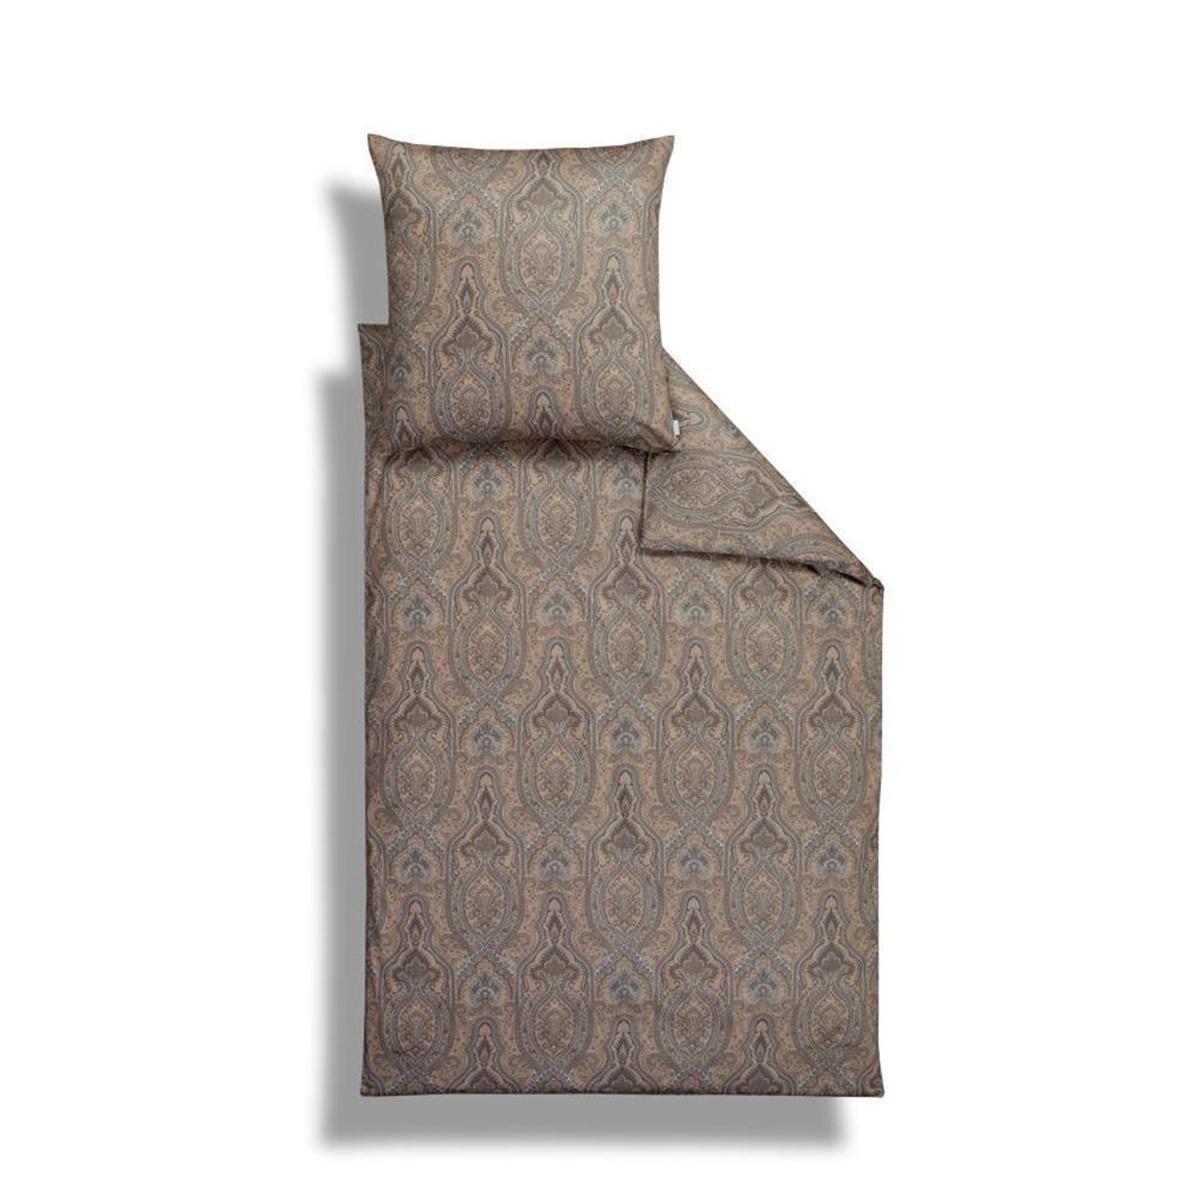 mako satin bettw sche estella fiorenzo mocca bettw sche mako satin bettw sche. Black Bedroom Furniture Sets. Home Design Ideas